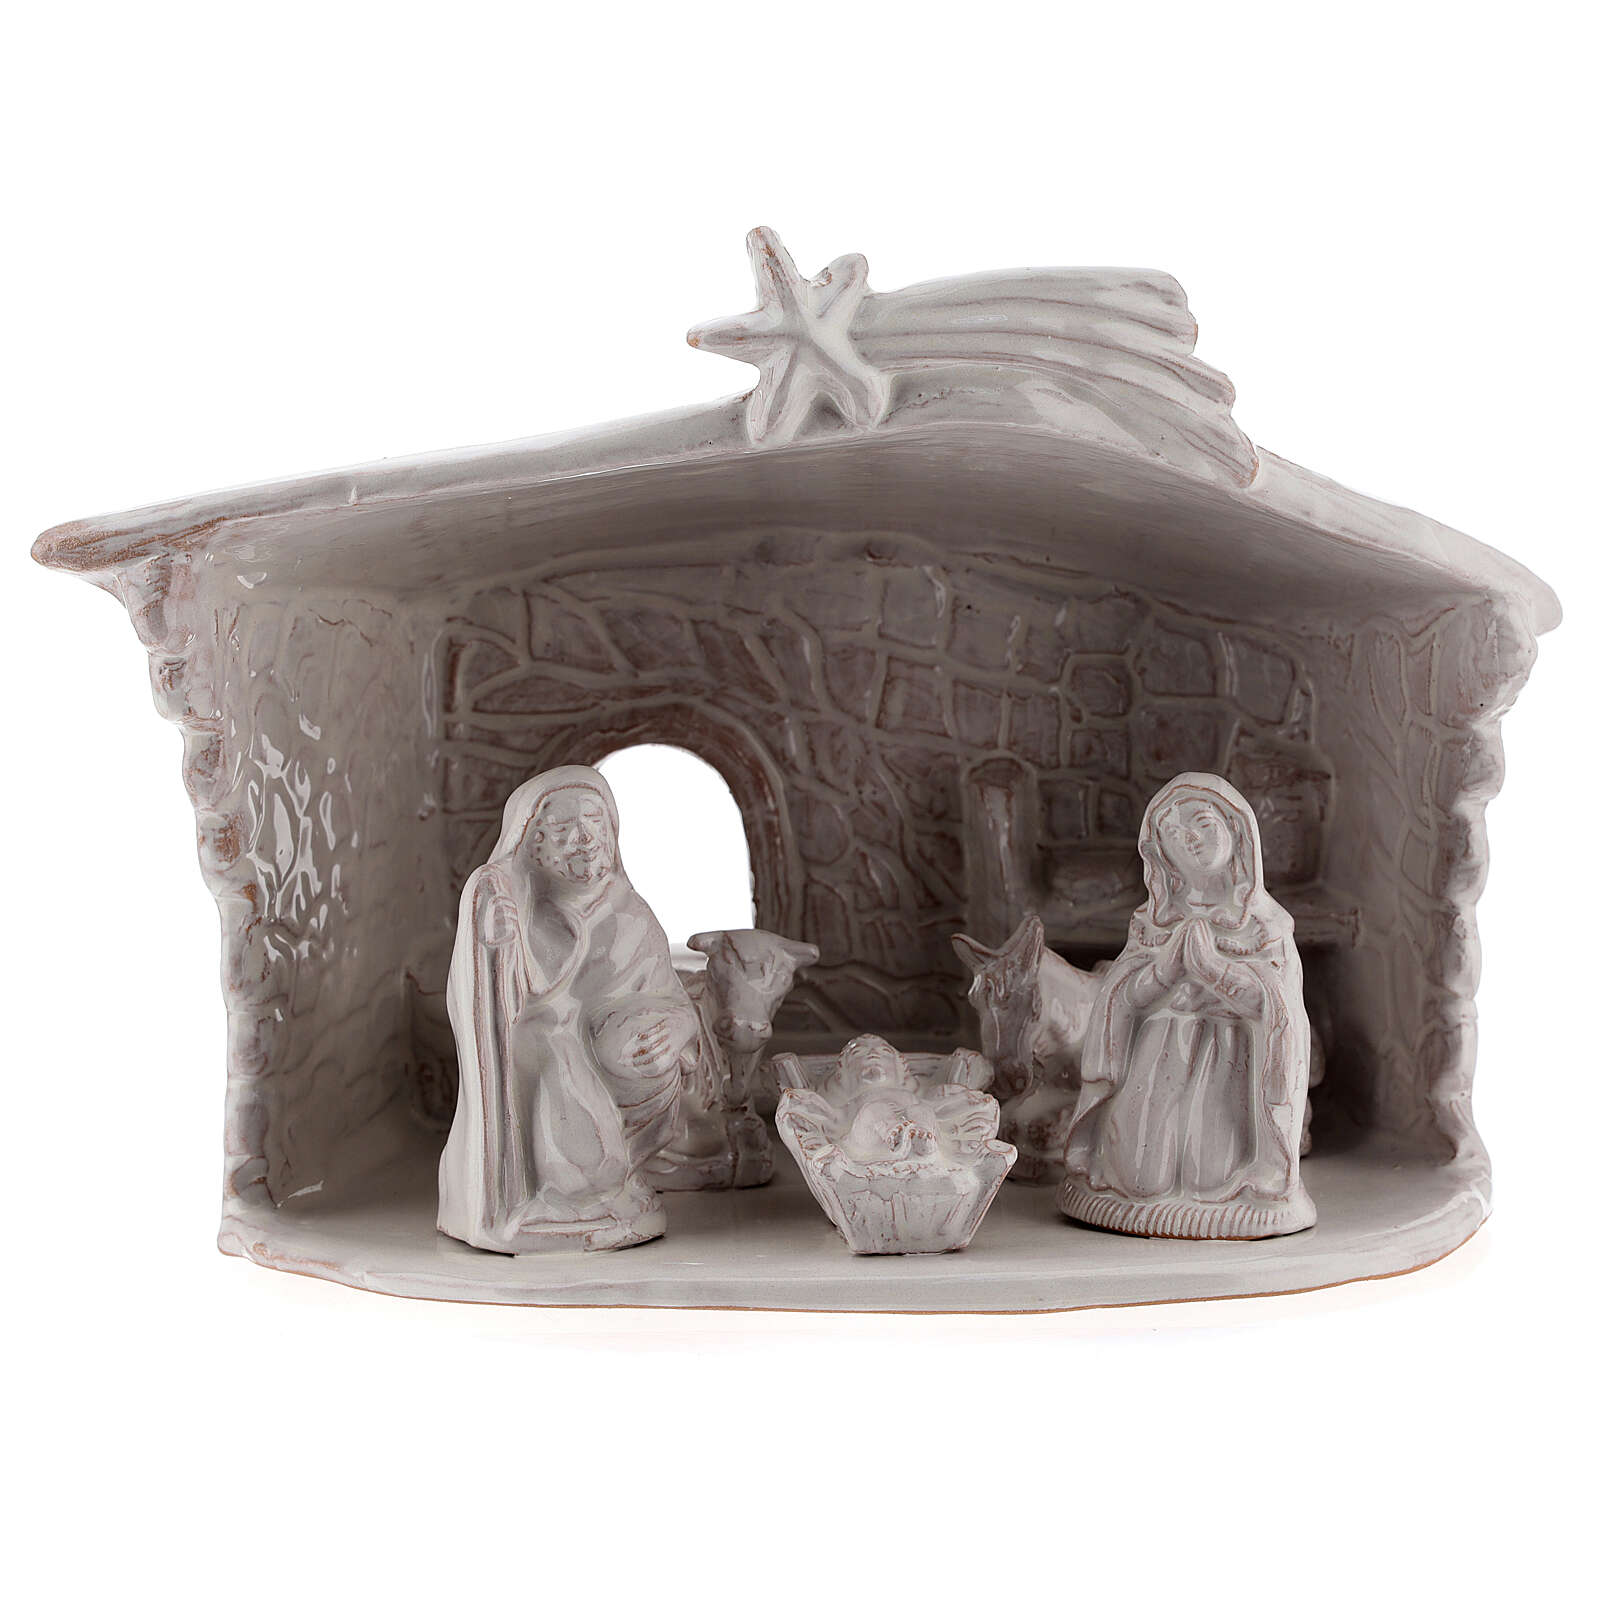 Nativity hut in white Deruta terracotta 20 cm 4